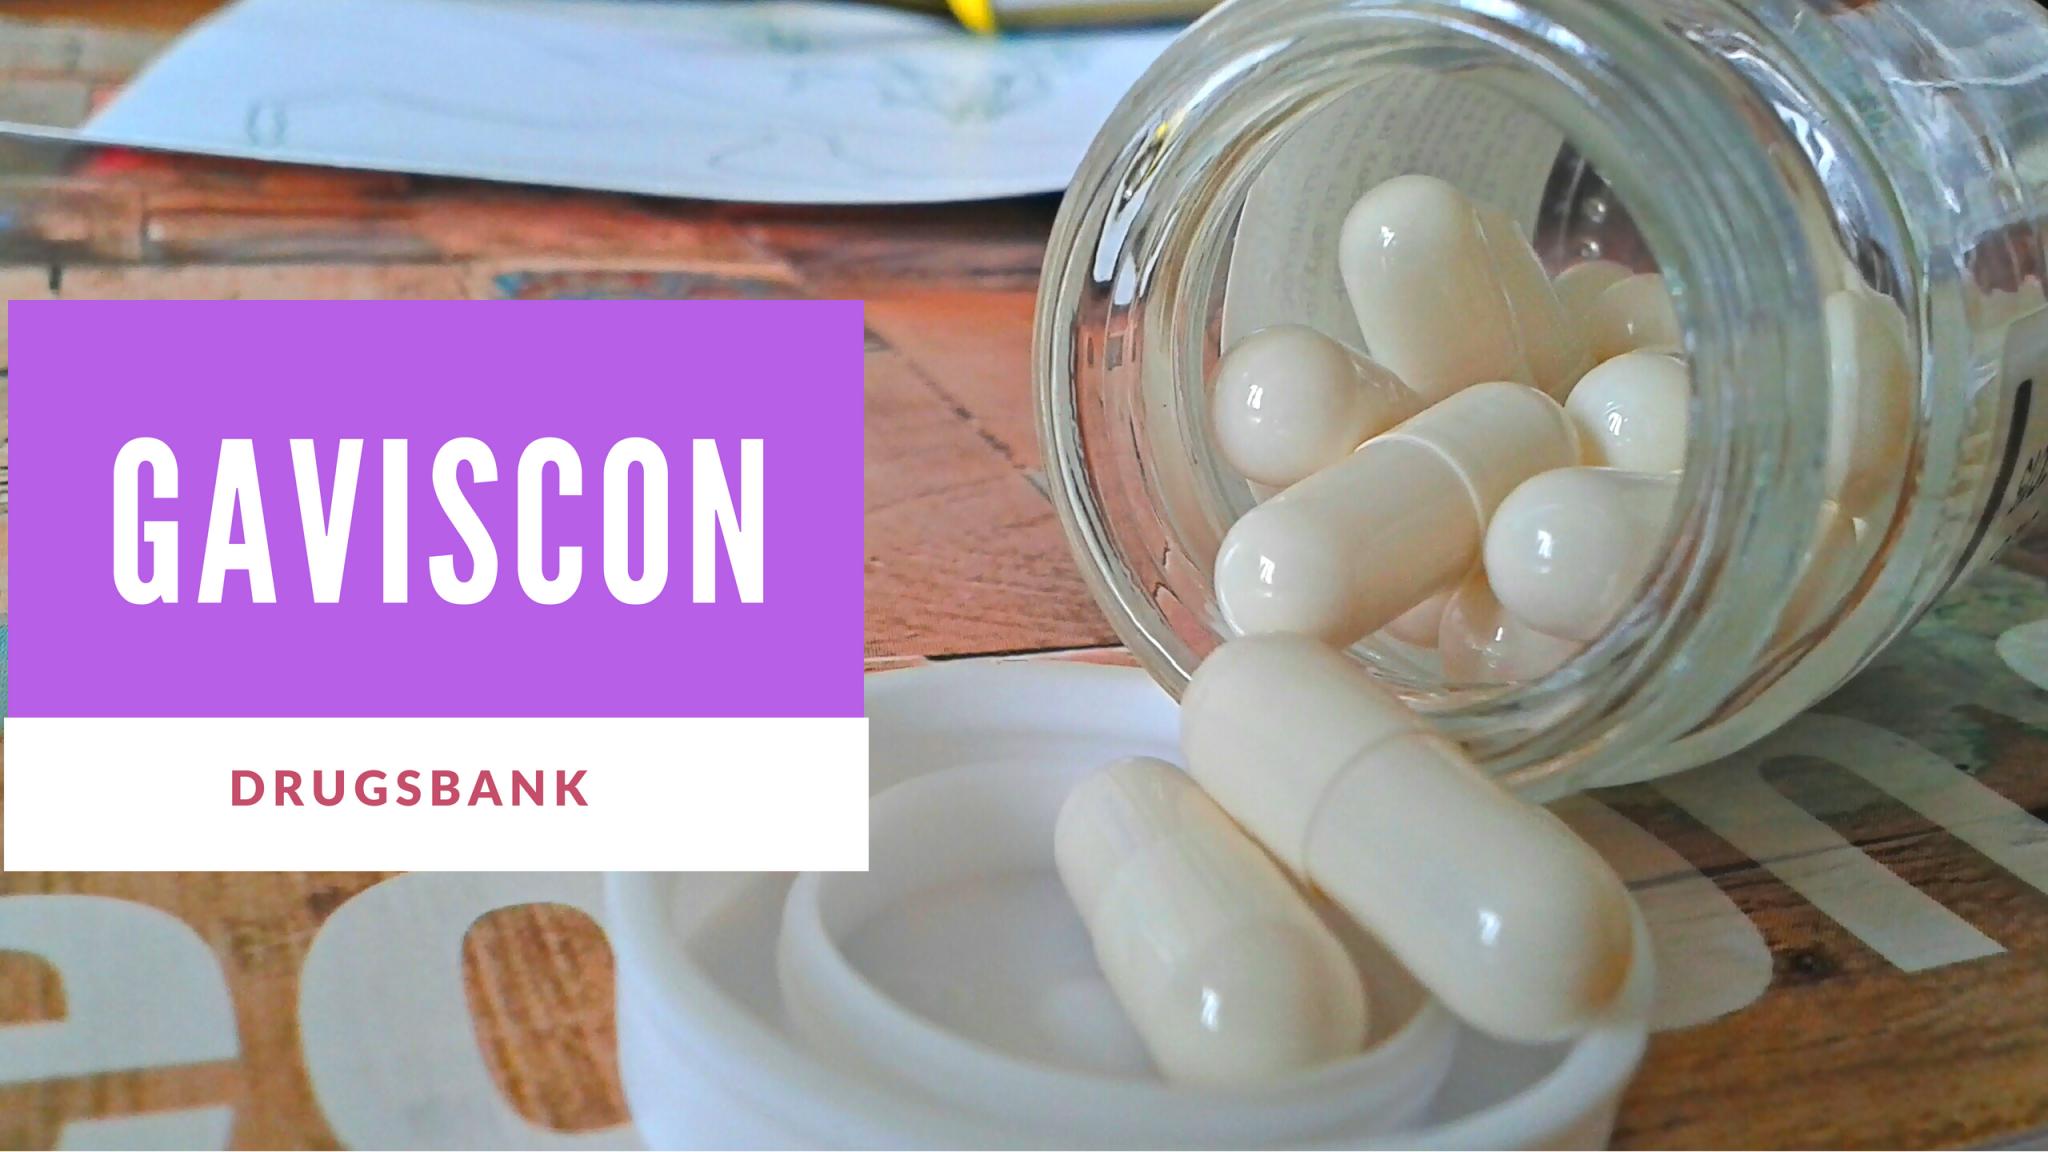 Gaviscon:The Best Medicine For Heart Burn & GERD